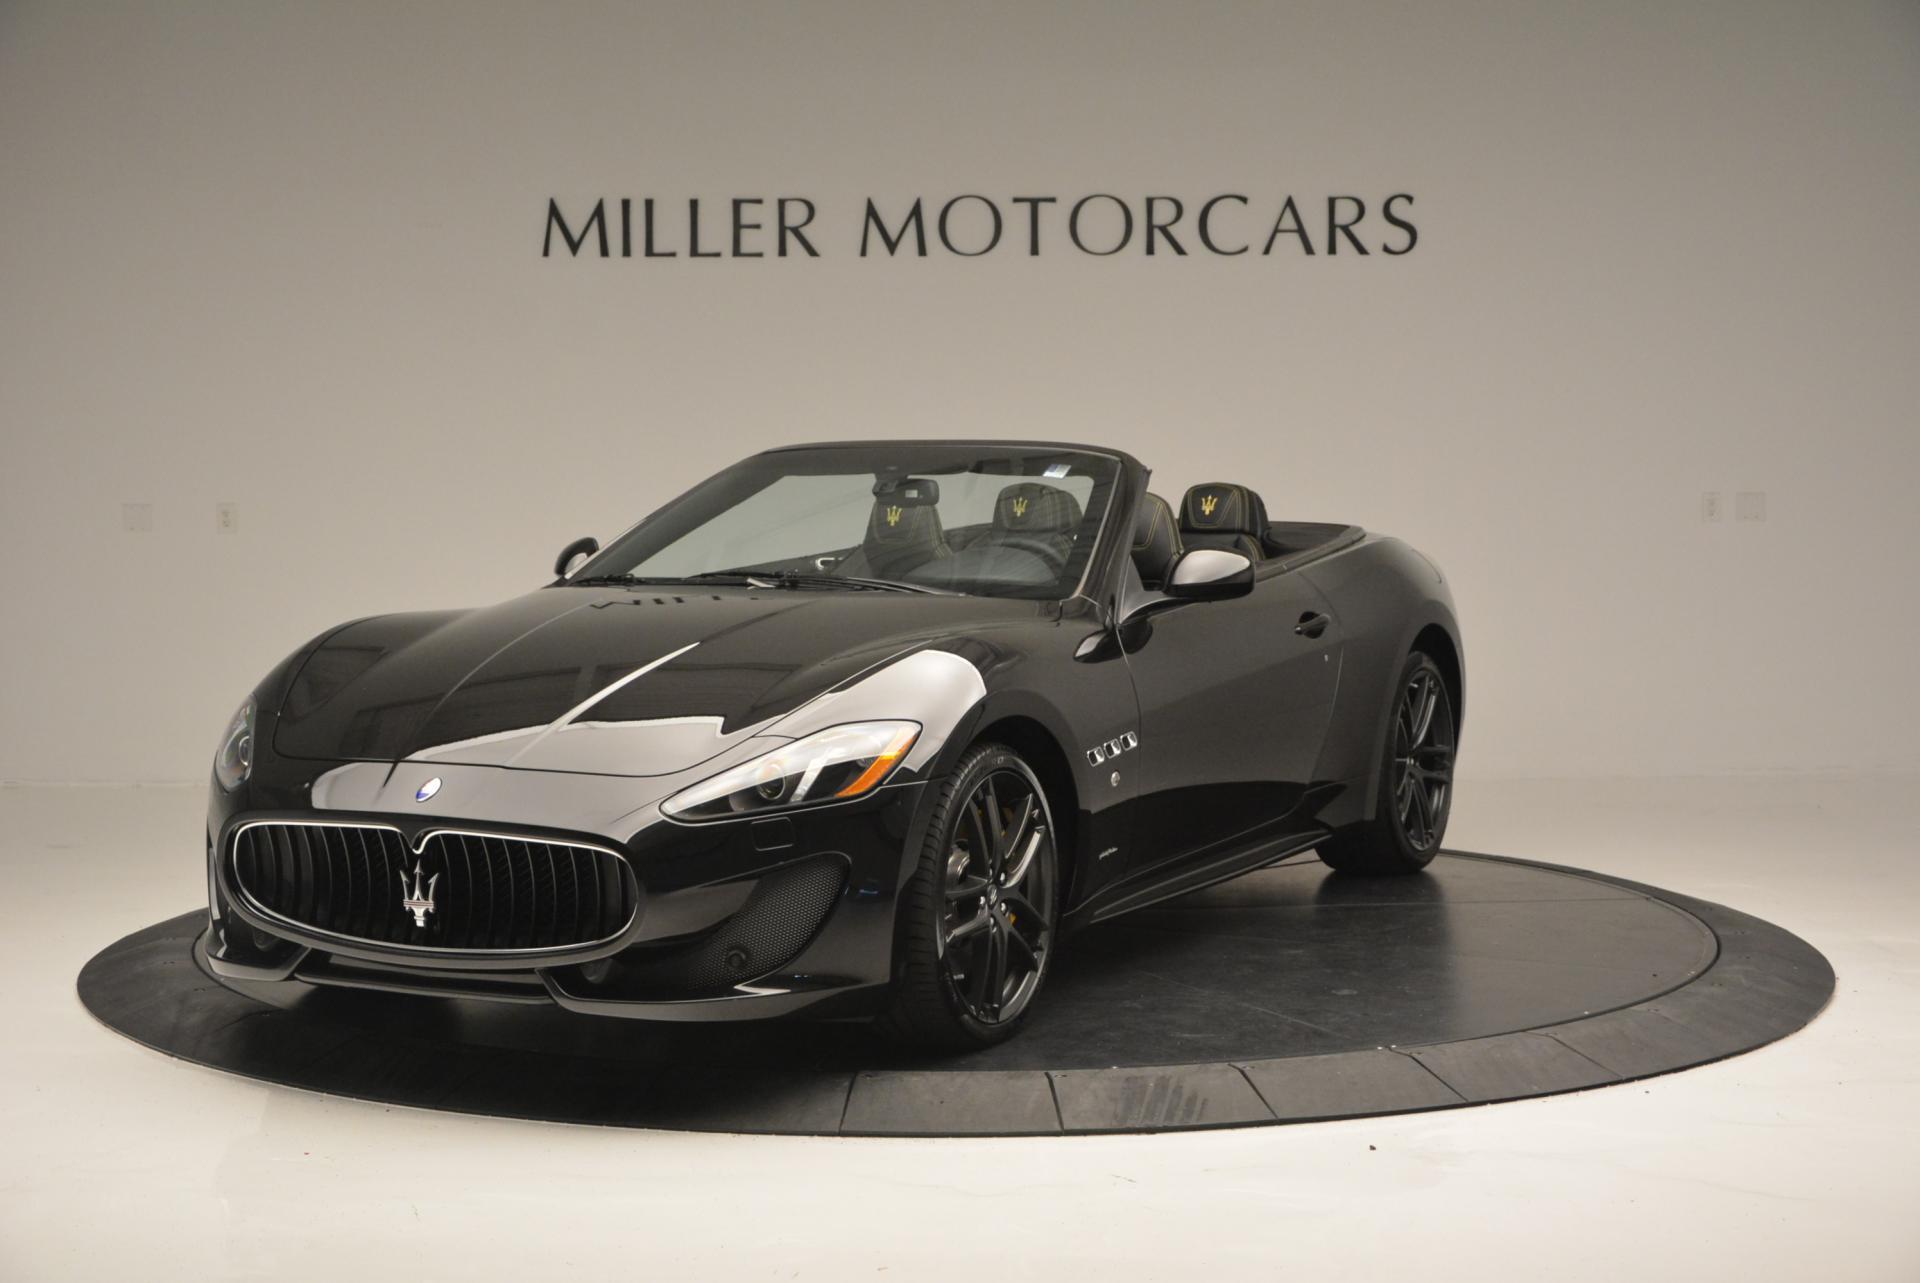 New 2017 Maserati GranTurismo Convertible Sport For Sale In Westport, CT 159_main